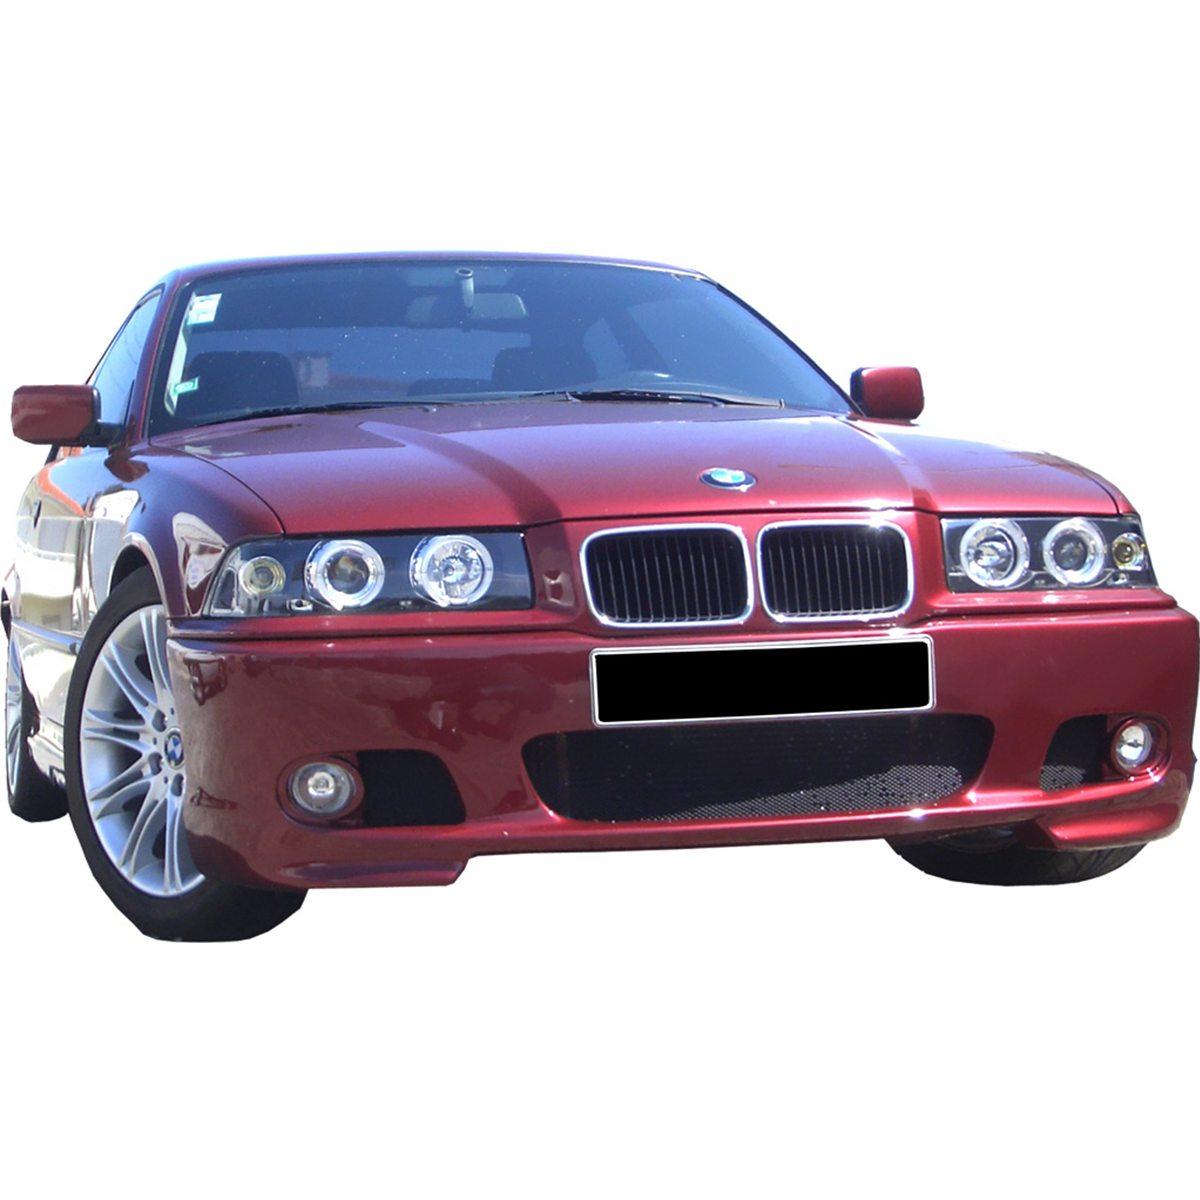 BMW-E36-M-Look-frt-PCU0071